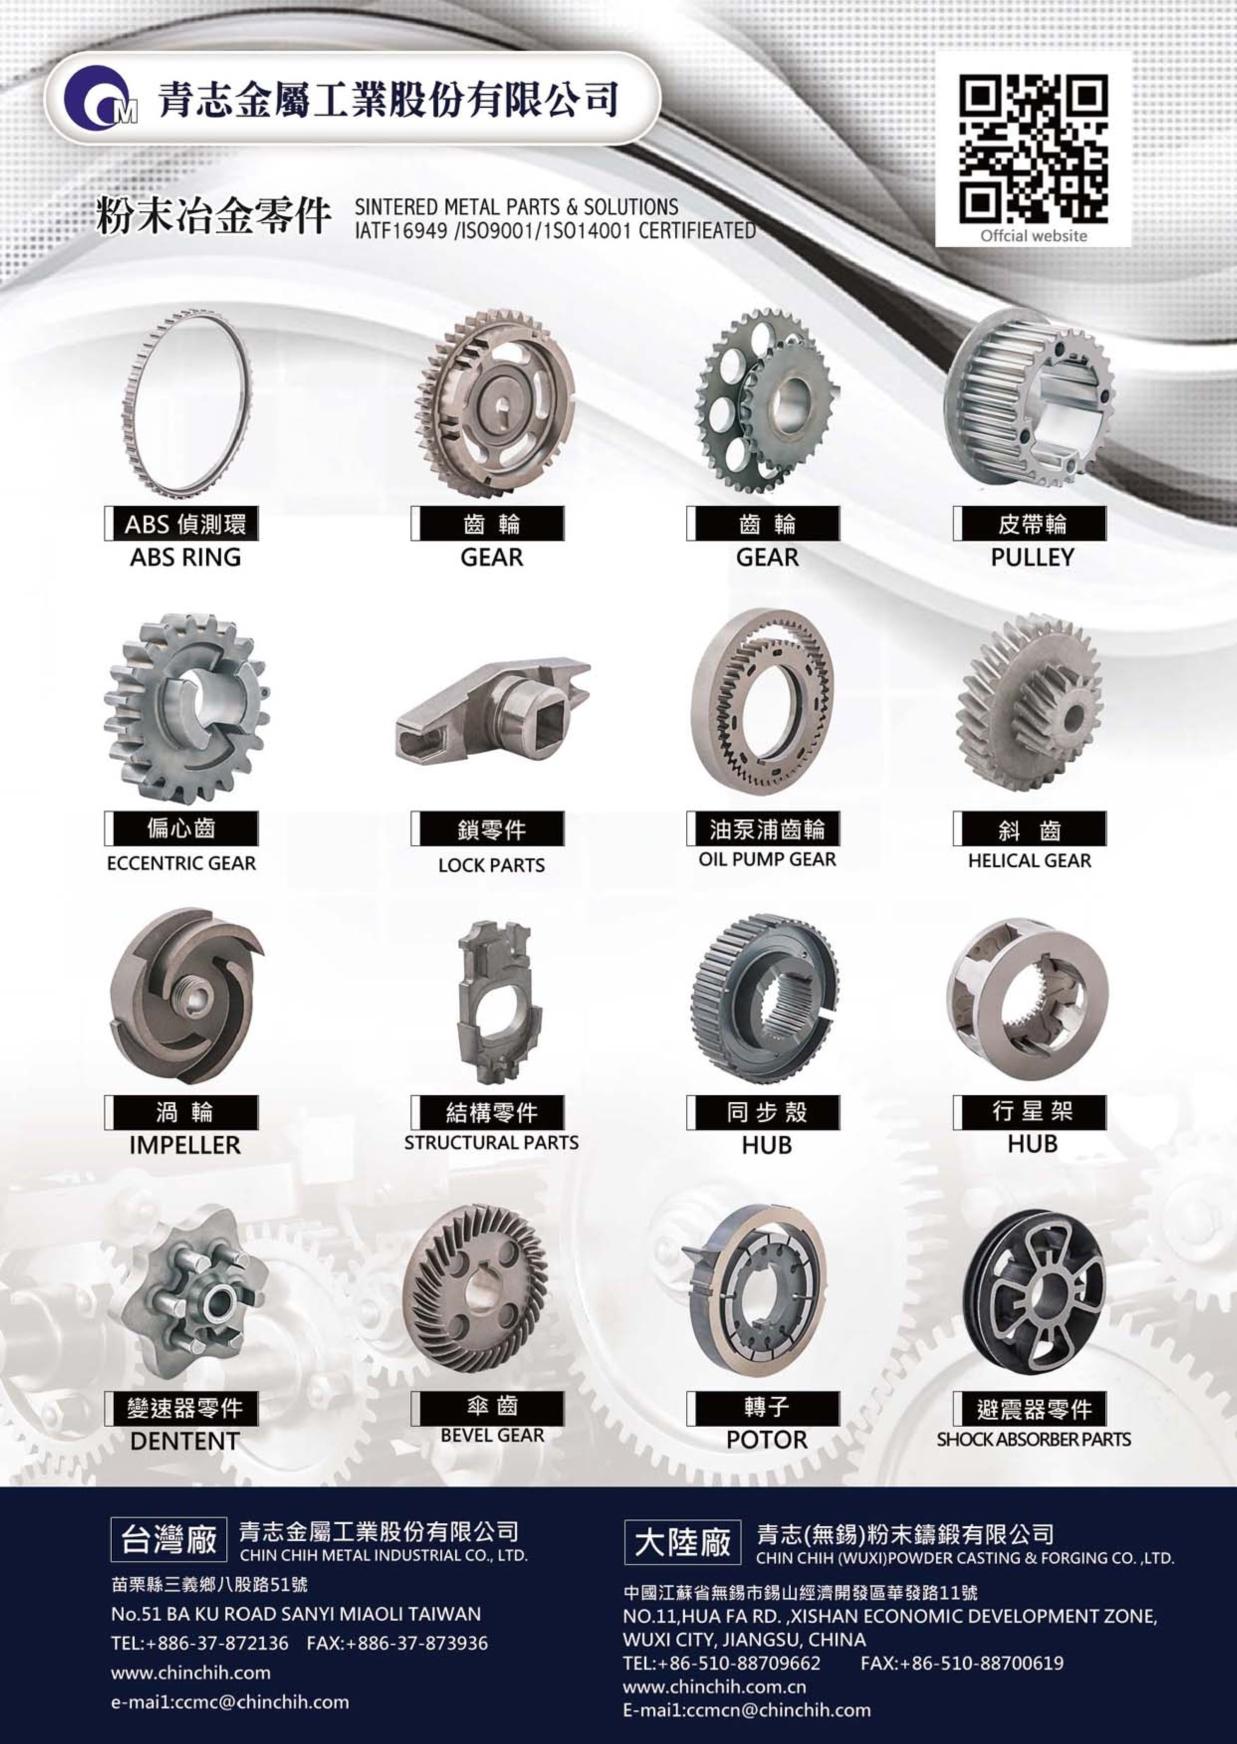 Taipei Int'l Auto Parts & Accessories Show (AMPA) CHIN CHIH METAL INDUSTRIAL CO., LTD.